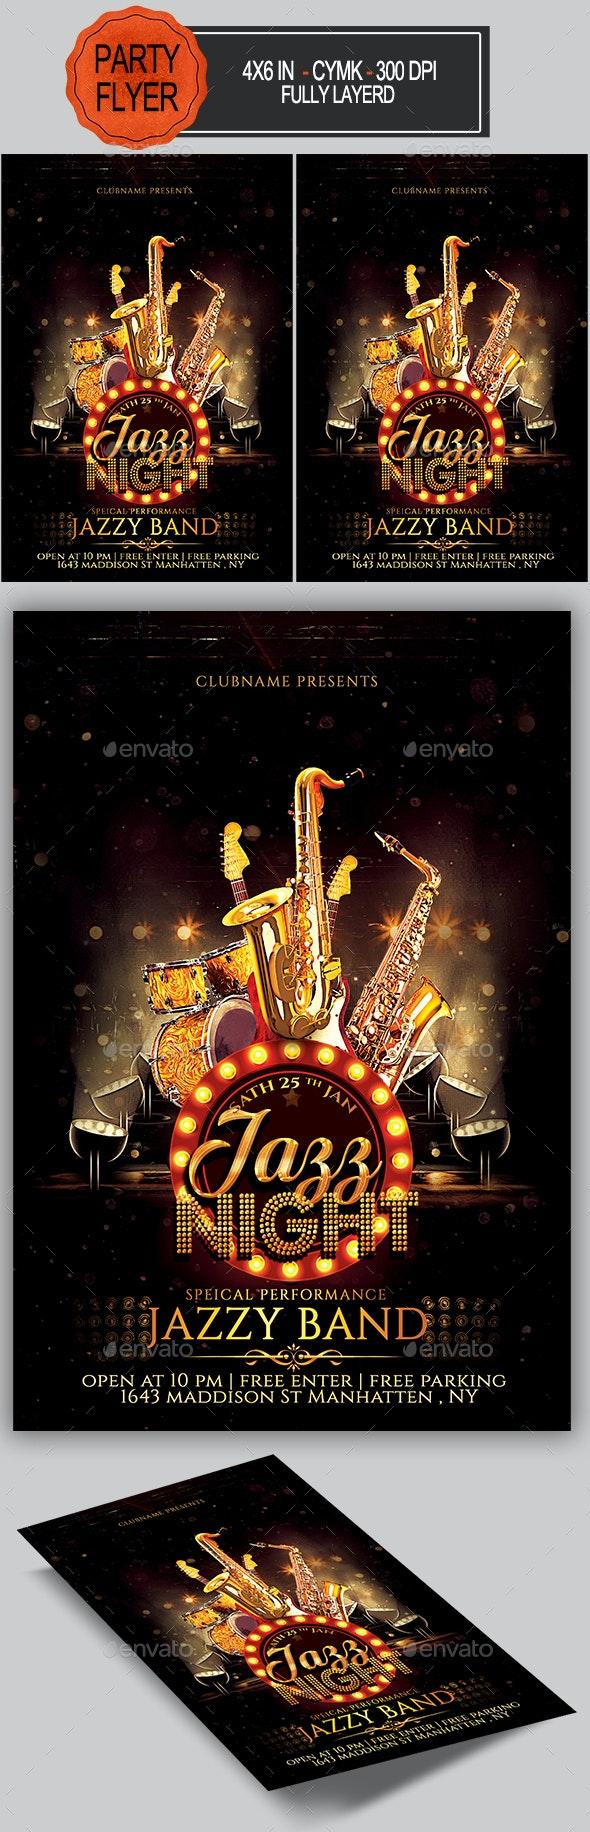 Jazz Flyer - Concerts Events